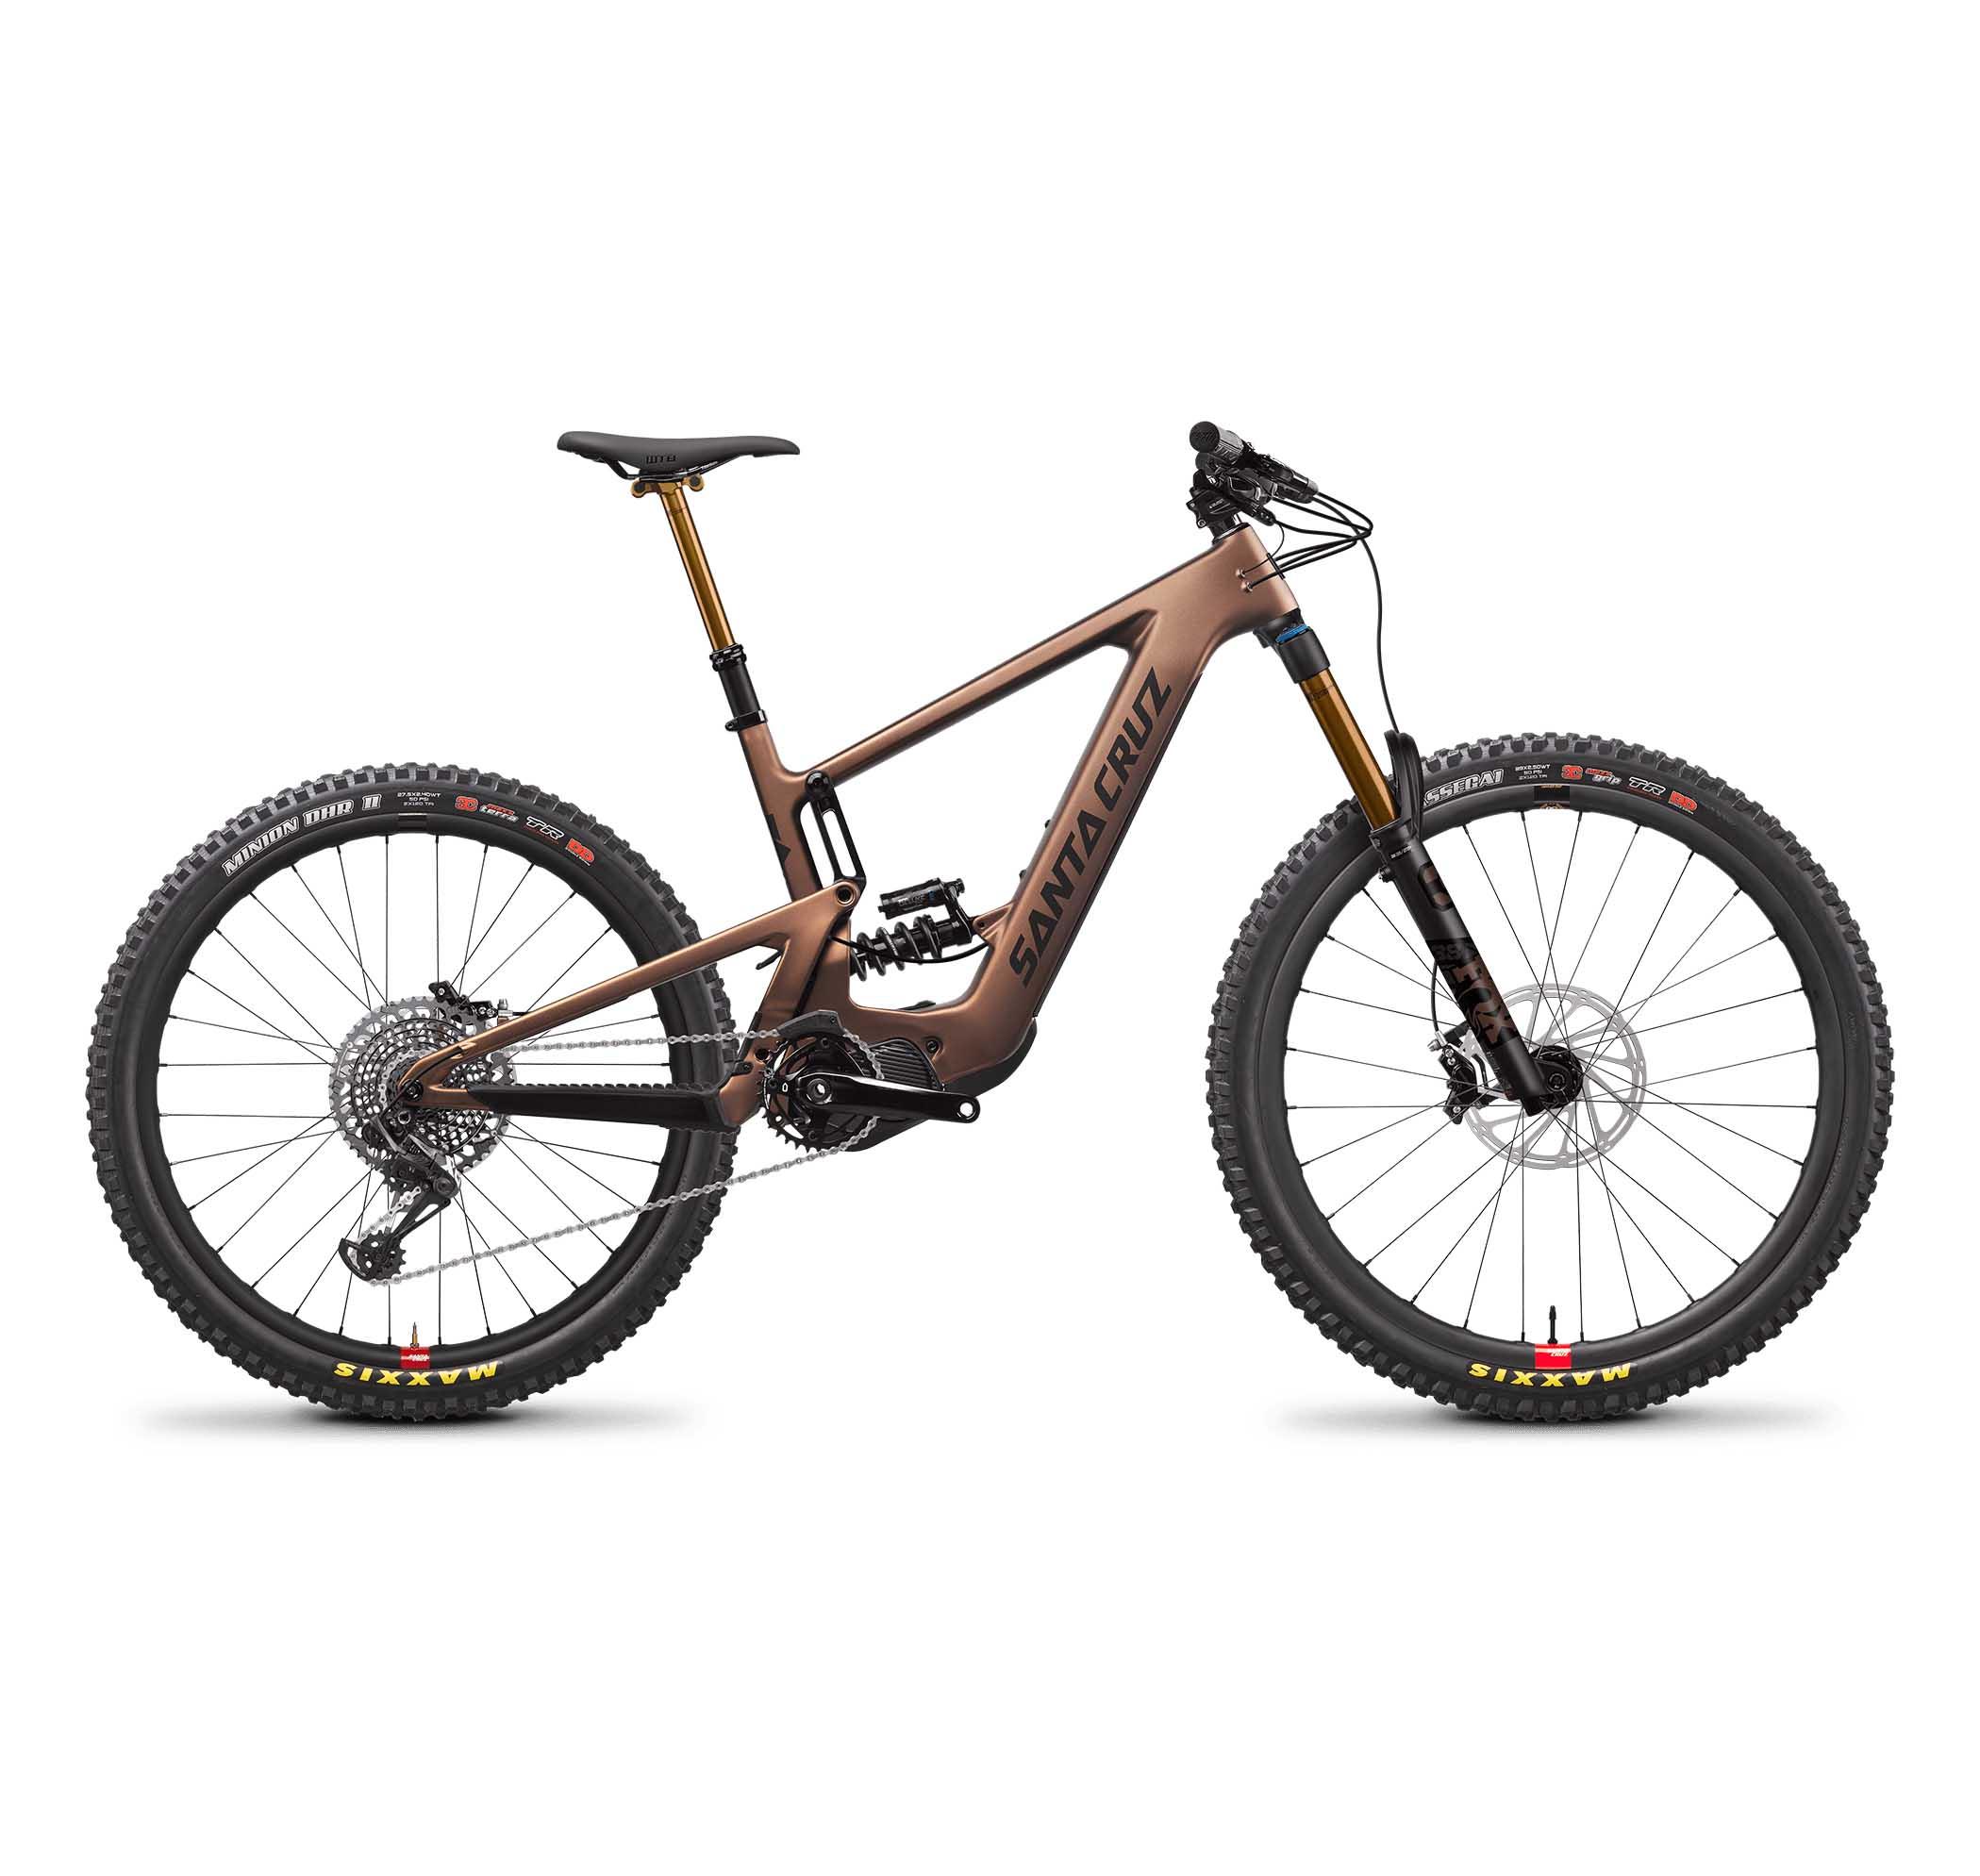 Santacruz_Rodeo_Bullit_Coil_Copper